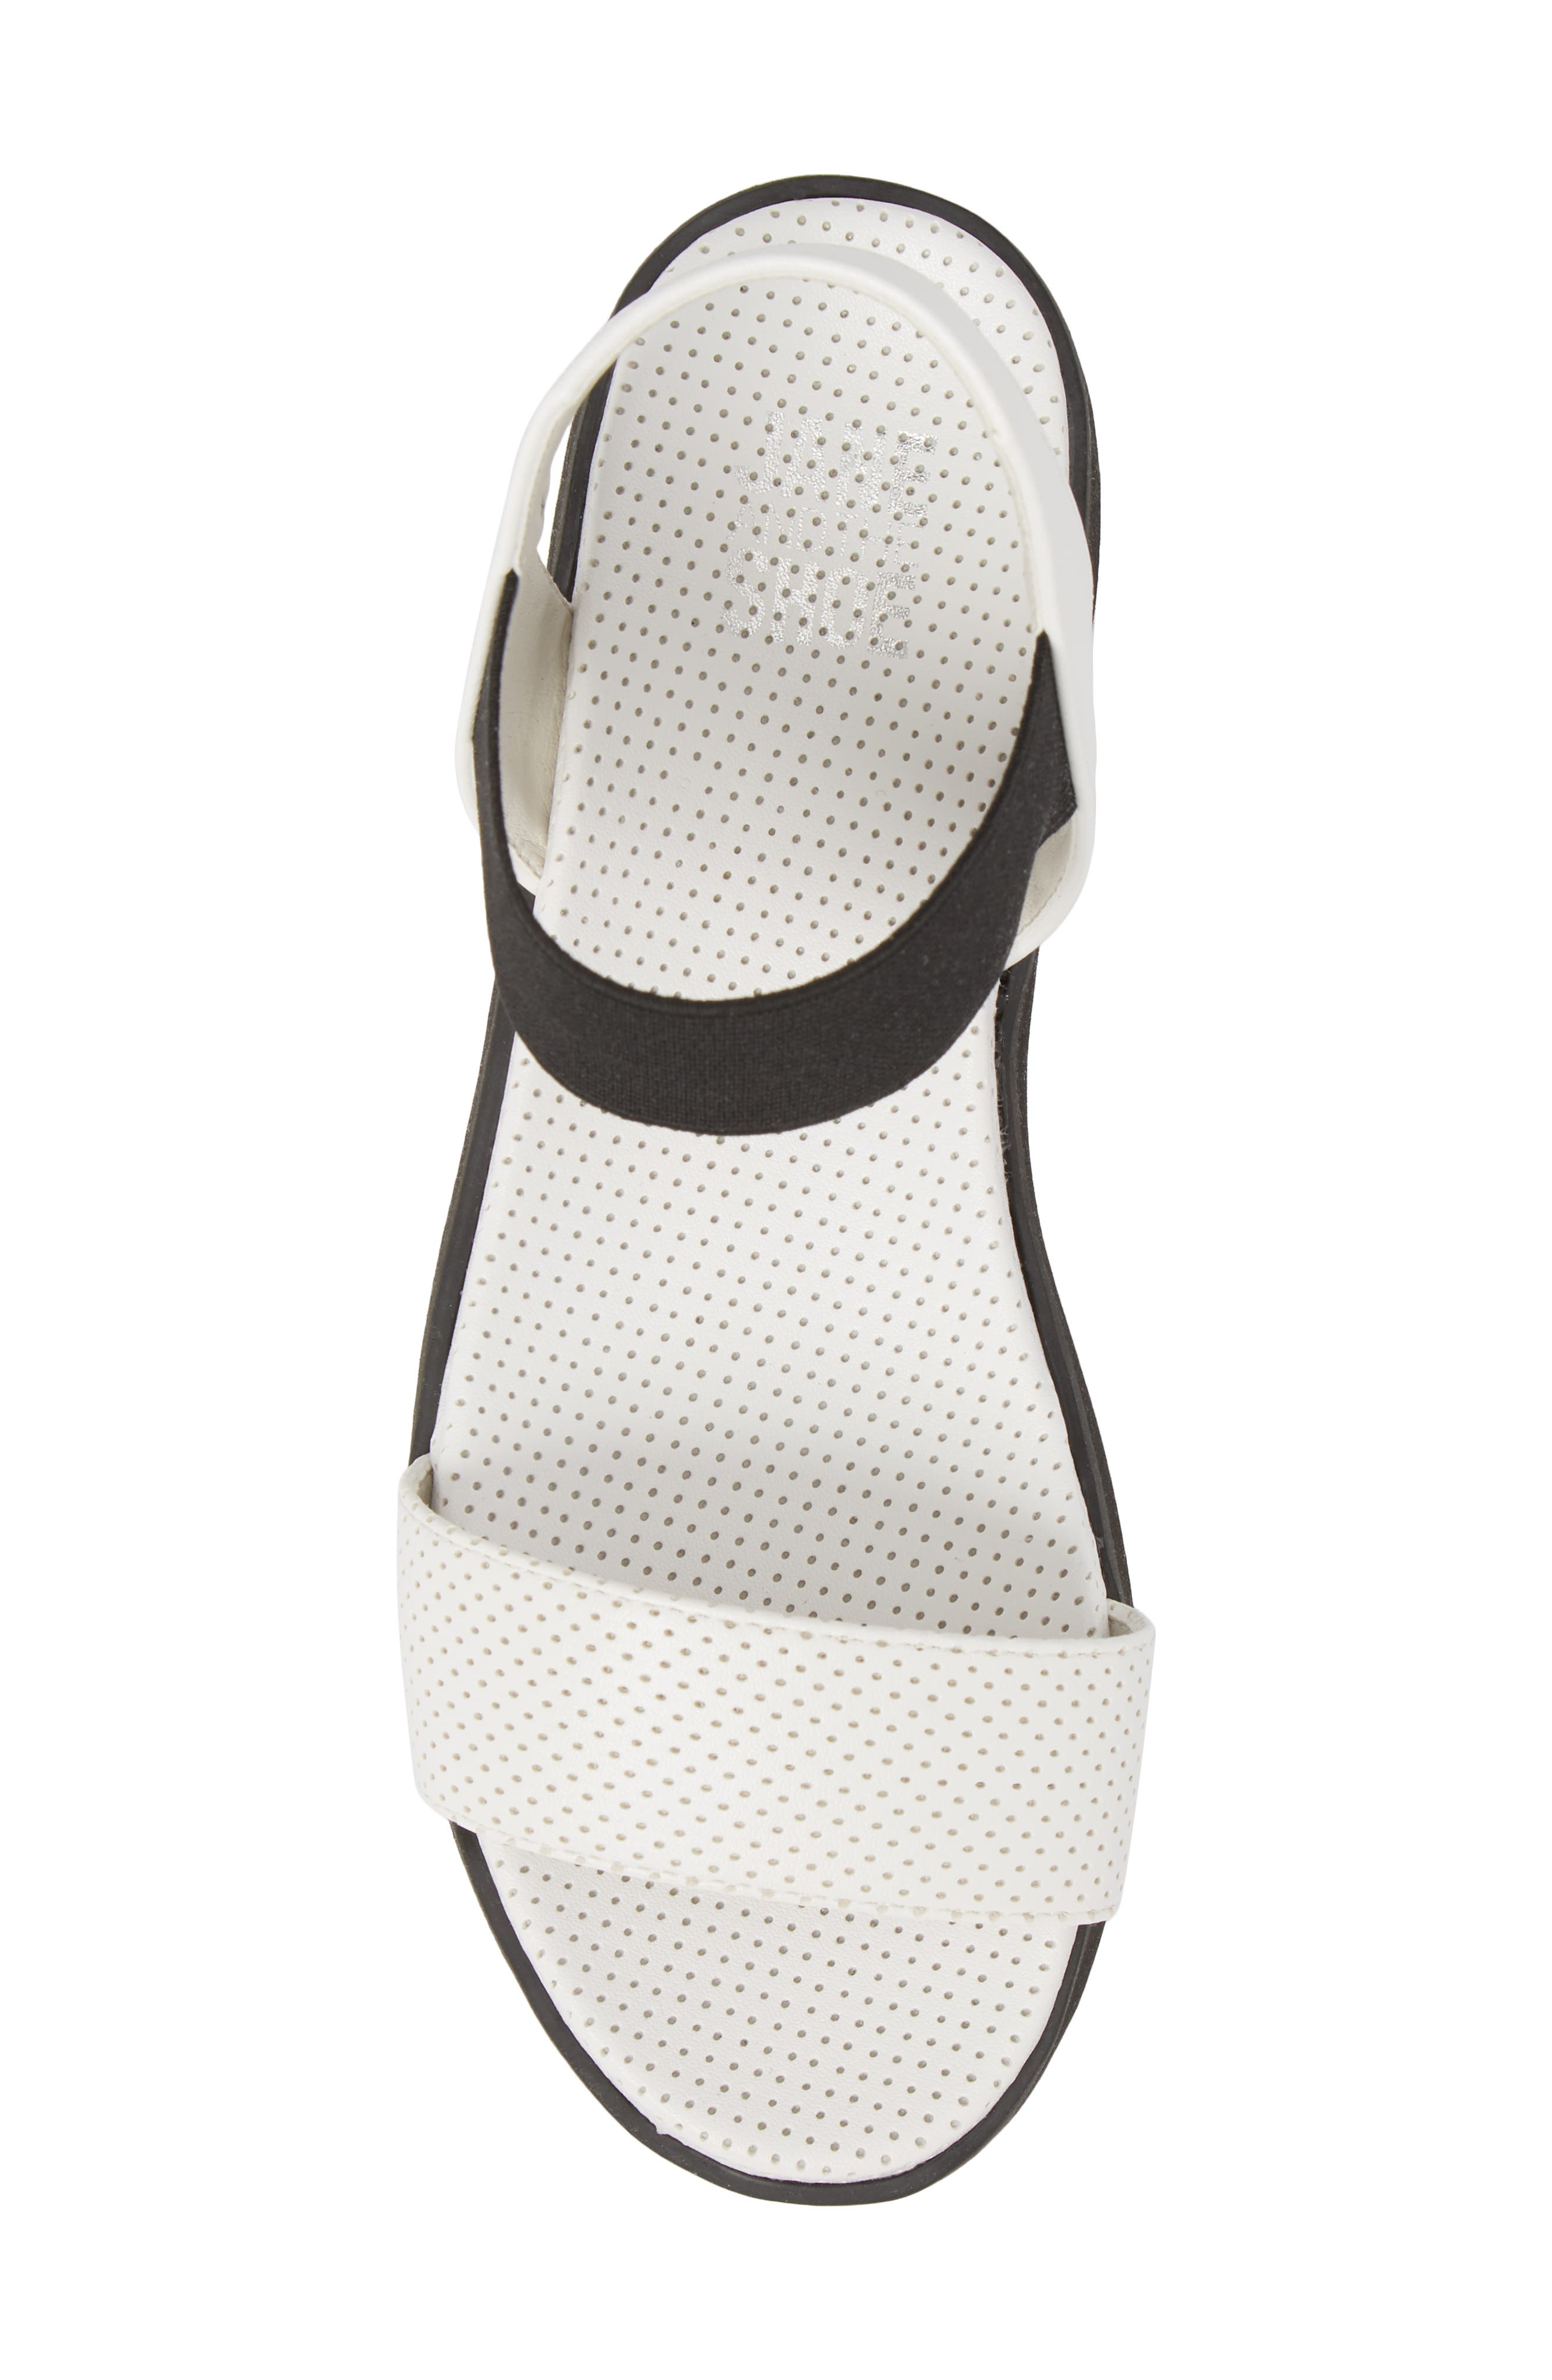 Josie Perforated Platform Sandal,                             Alternate thumbnail 4, color,                             White